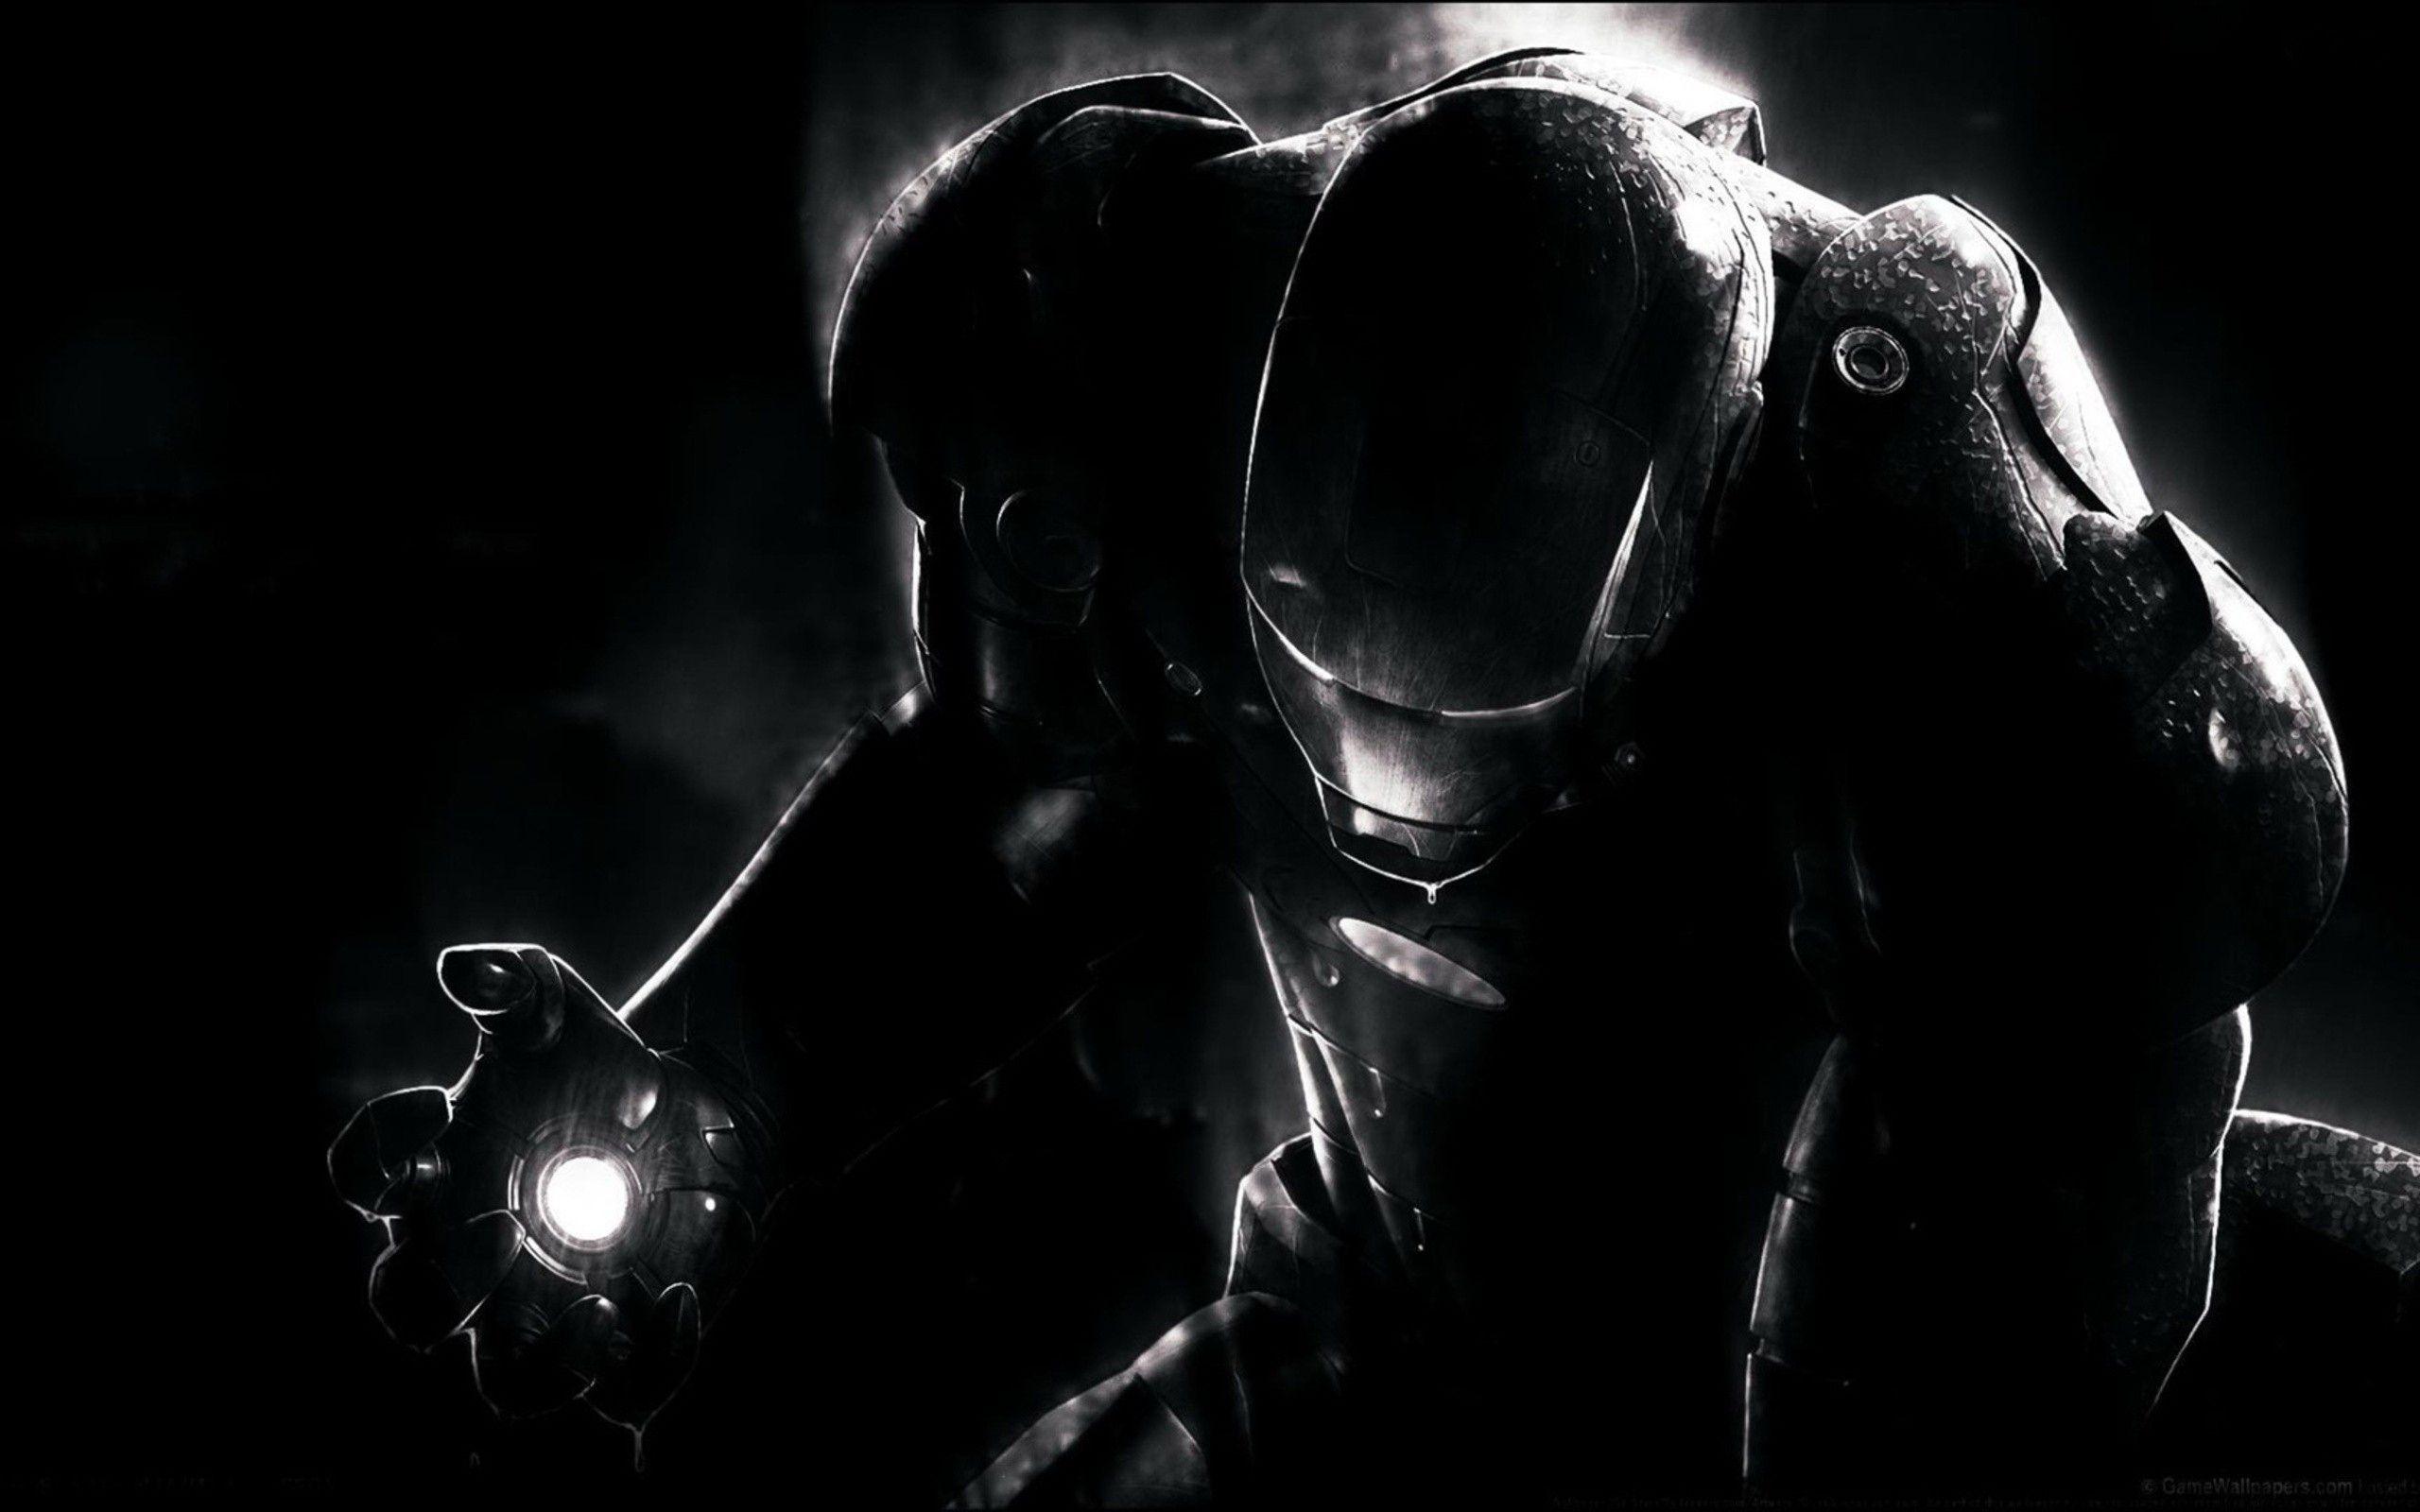 Dark Ironman Avengers Wallpapers For Desktop 75059 Hd